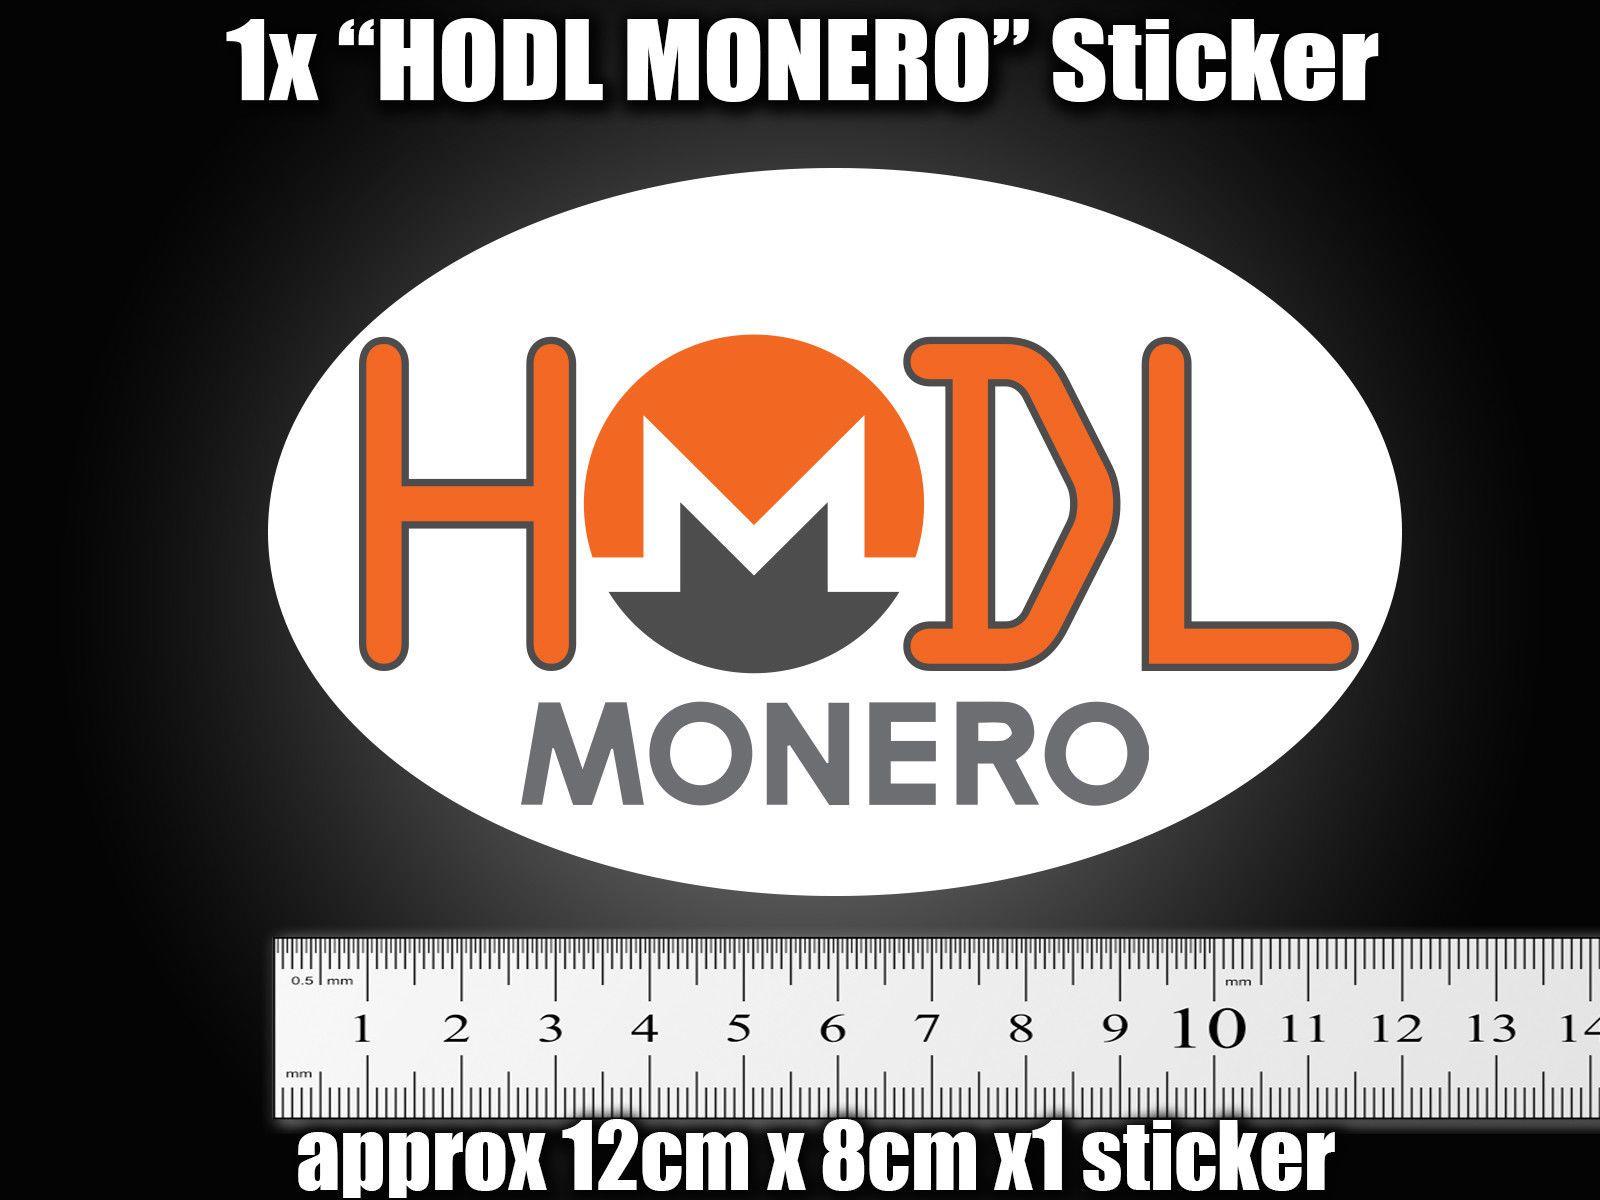 1x HODL MONERO Sticker decal shop sign car van XRP BTC ETH LTC XMR DASH Crypto